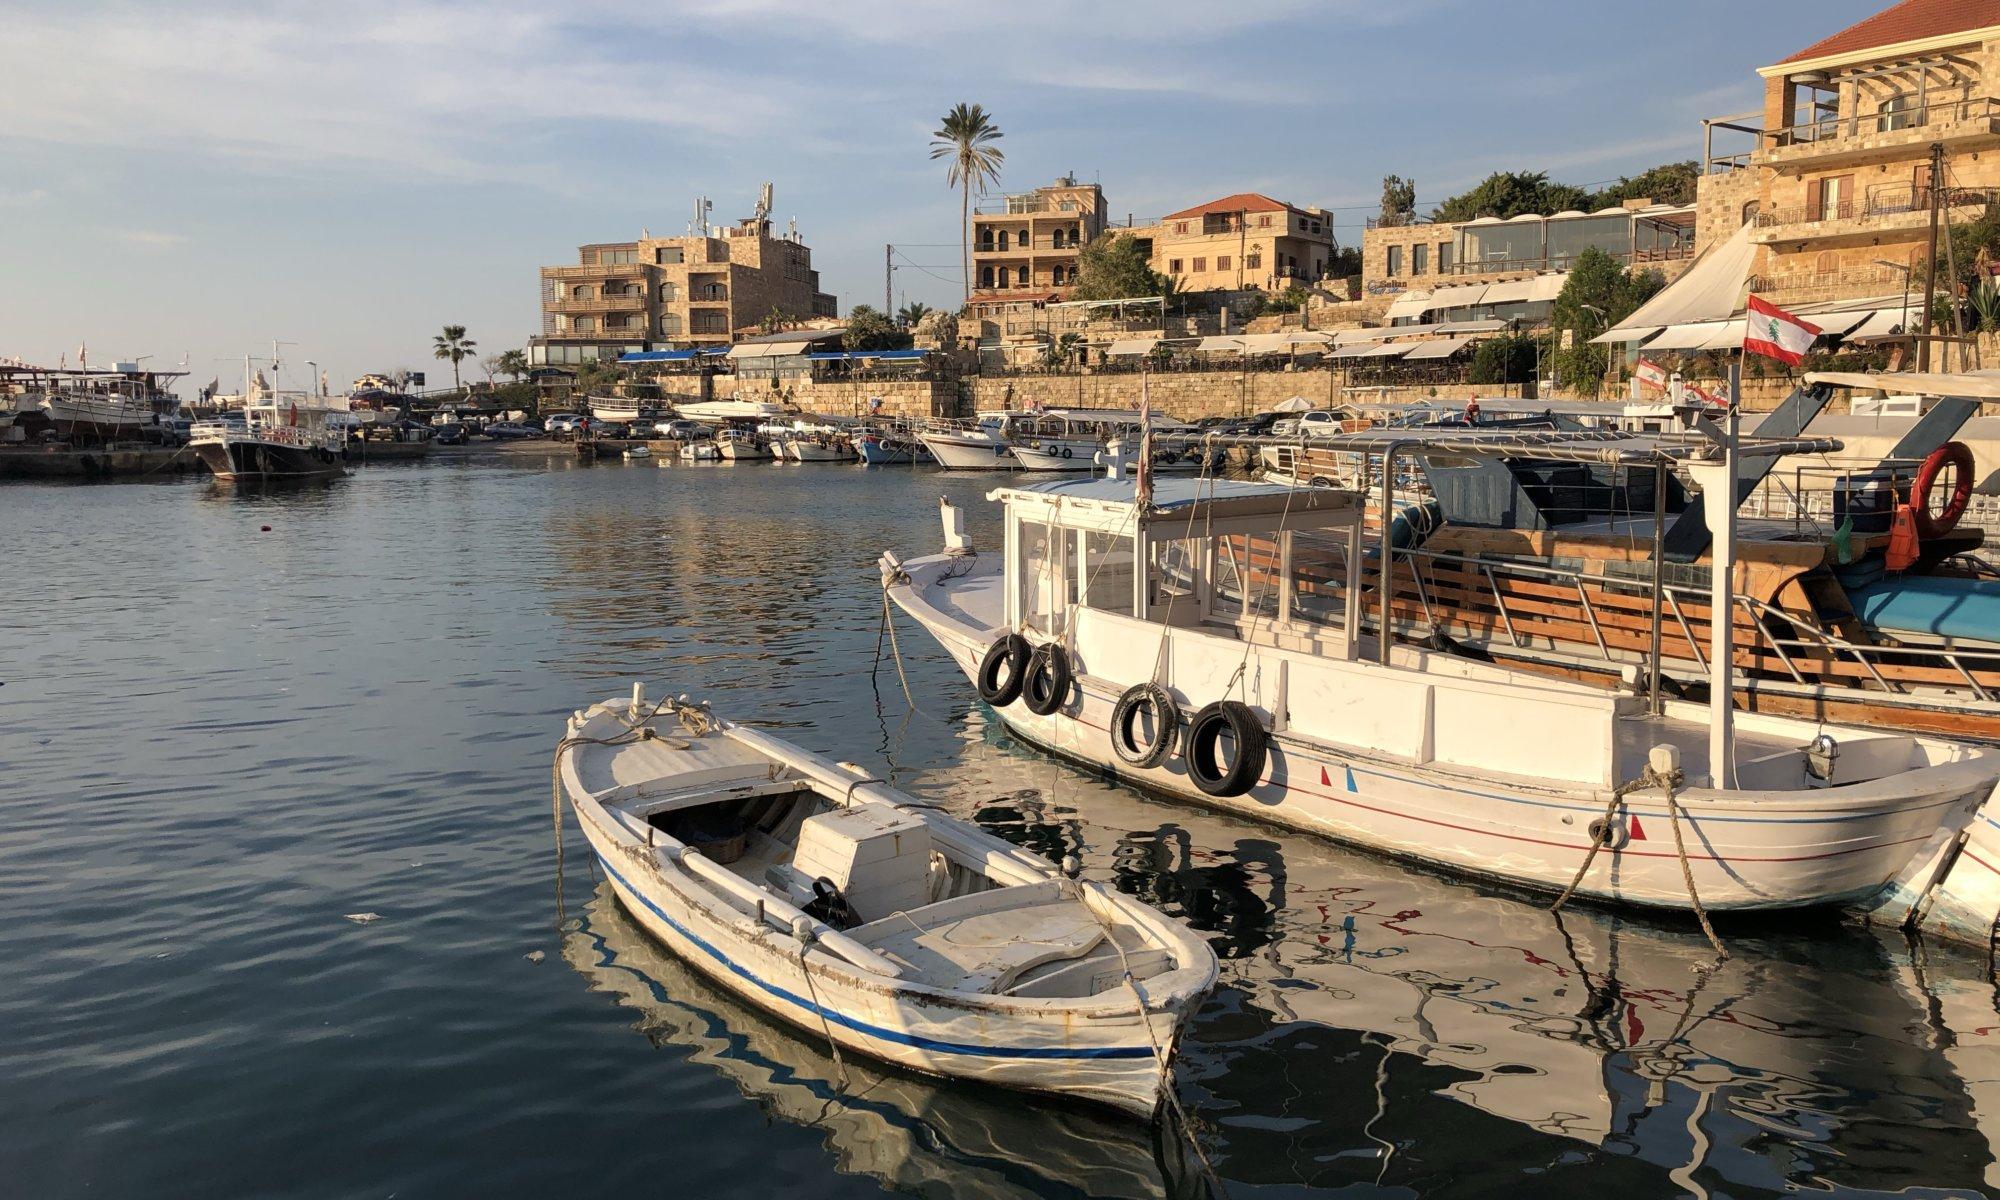 Harbour, Byblos